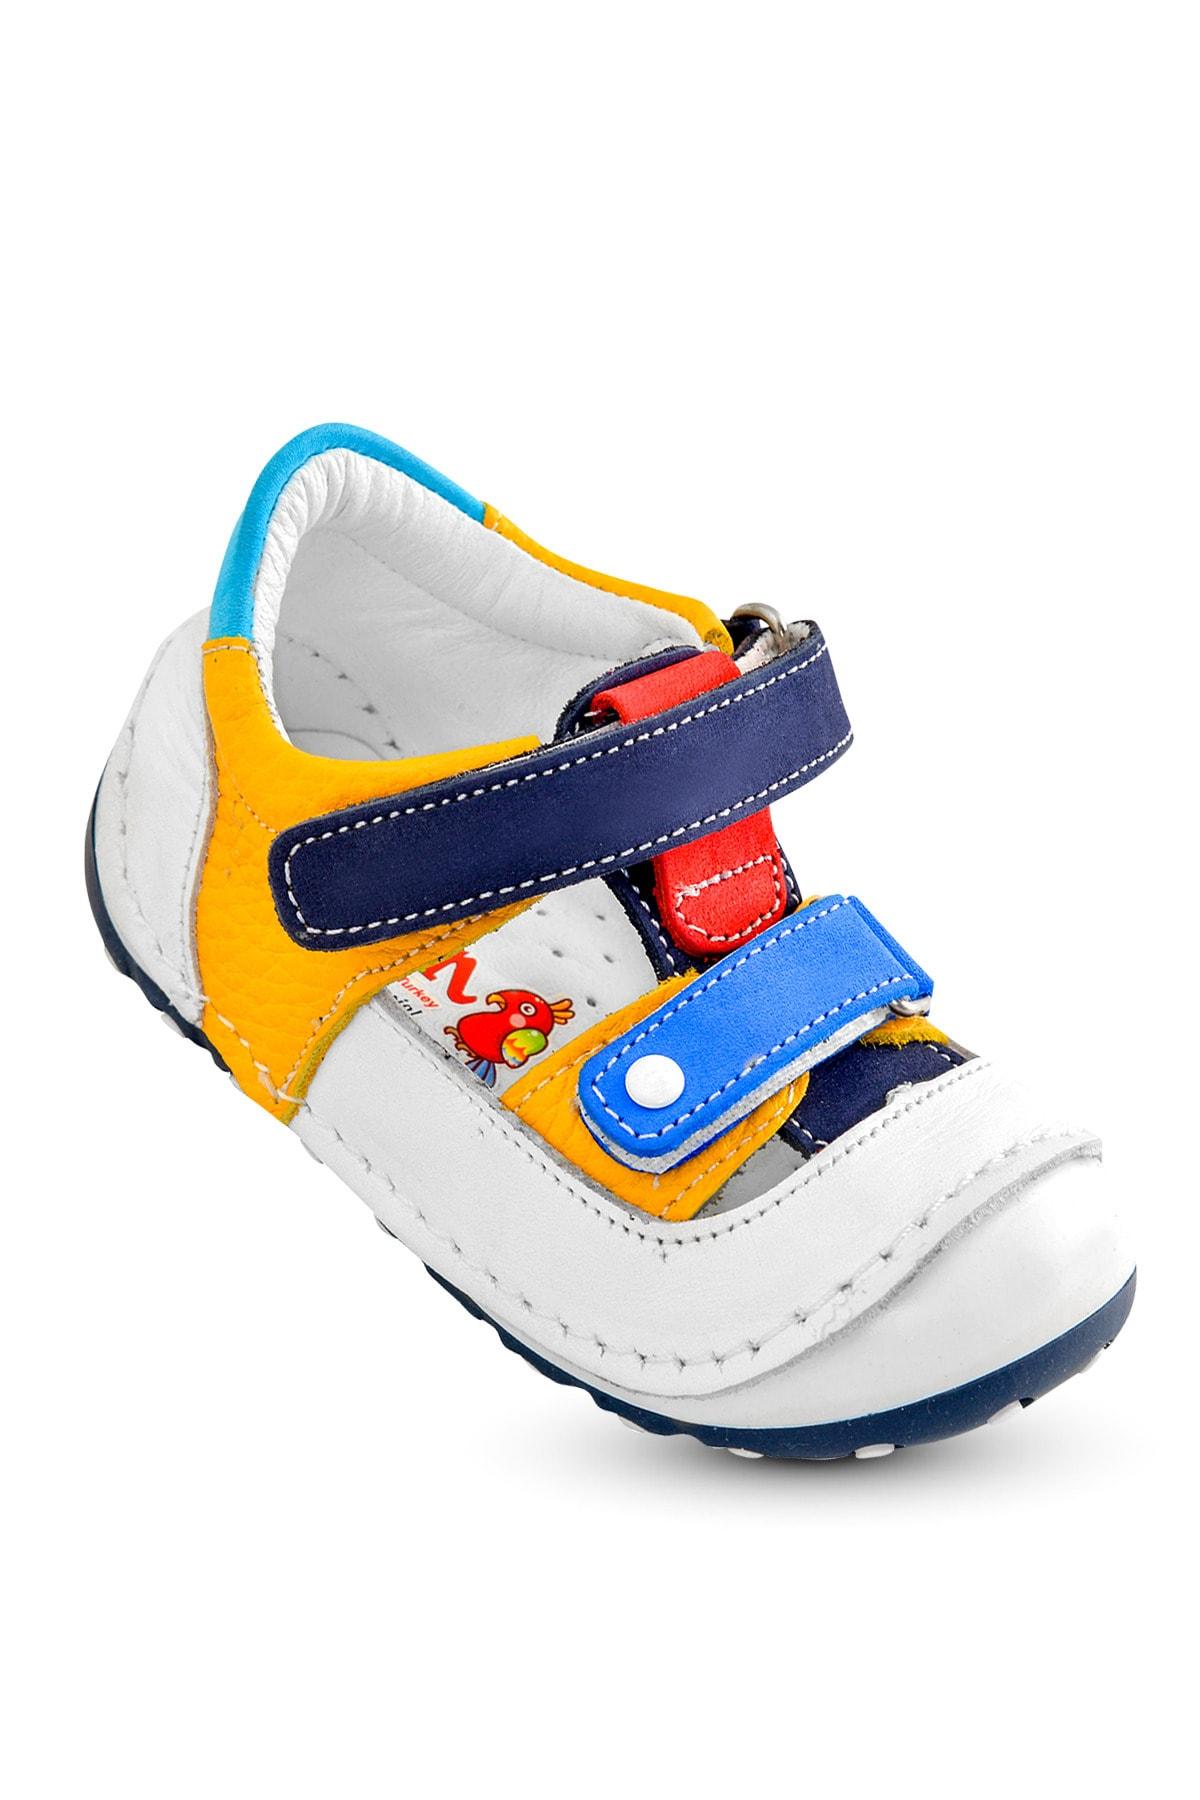 Flaneur Baby Boys Orthopedic Genuine Leather Sandals Shoes 2021 Premium Quality